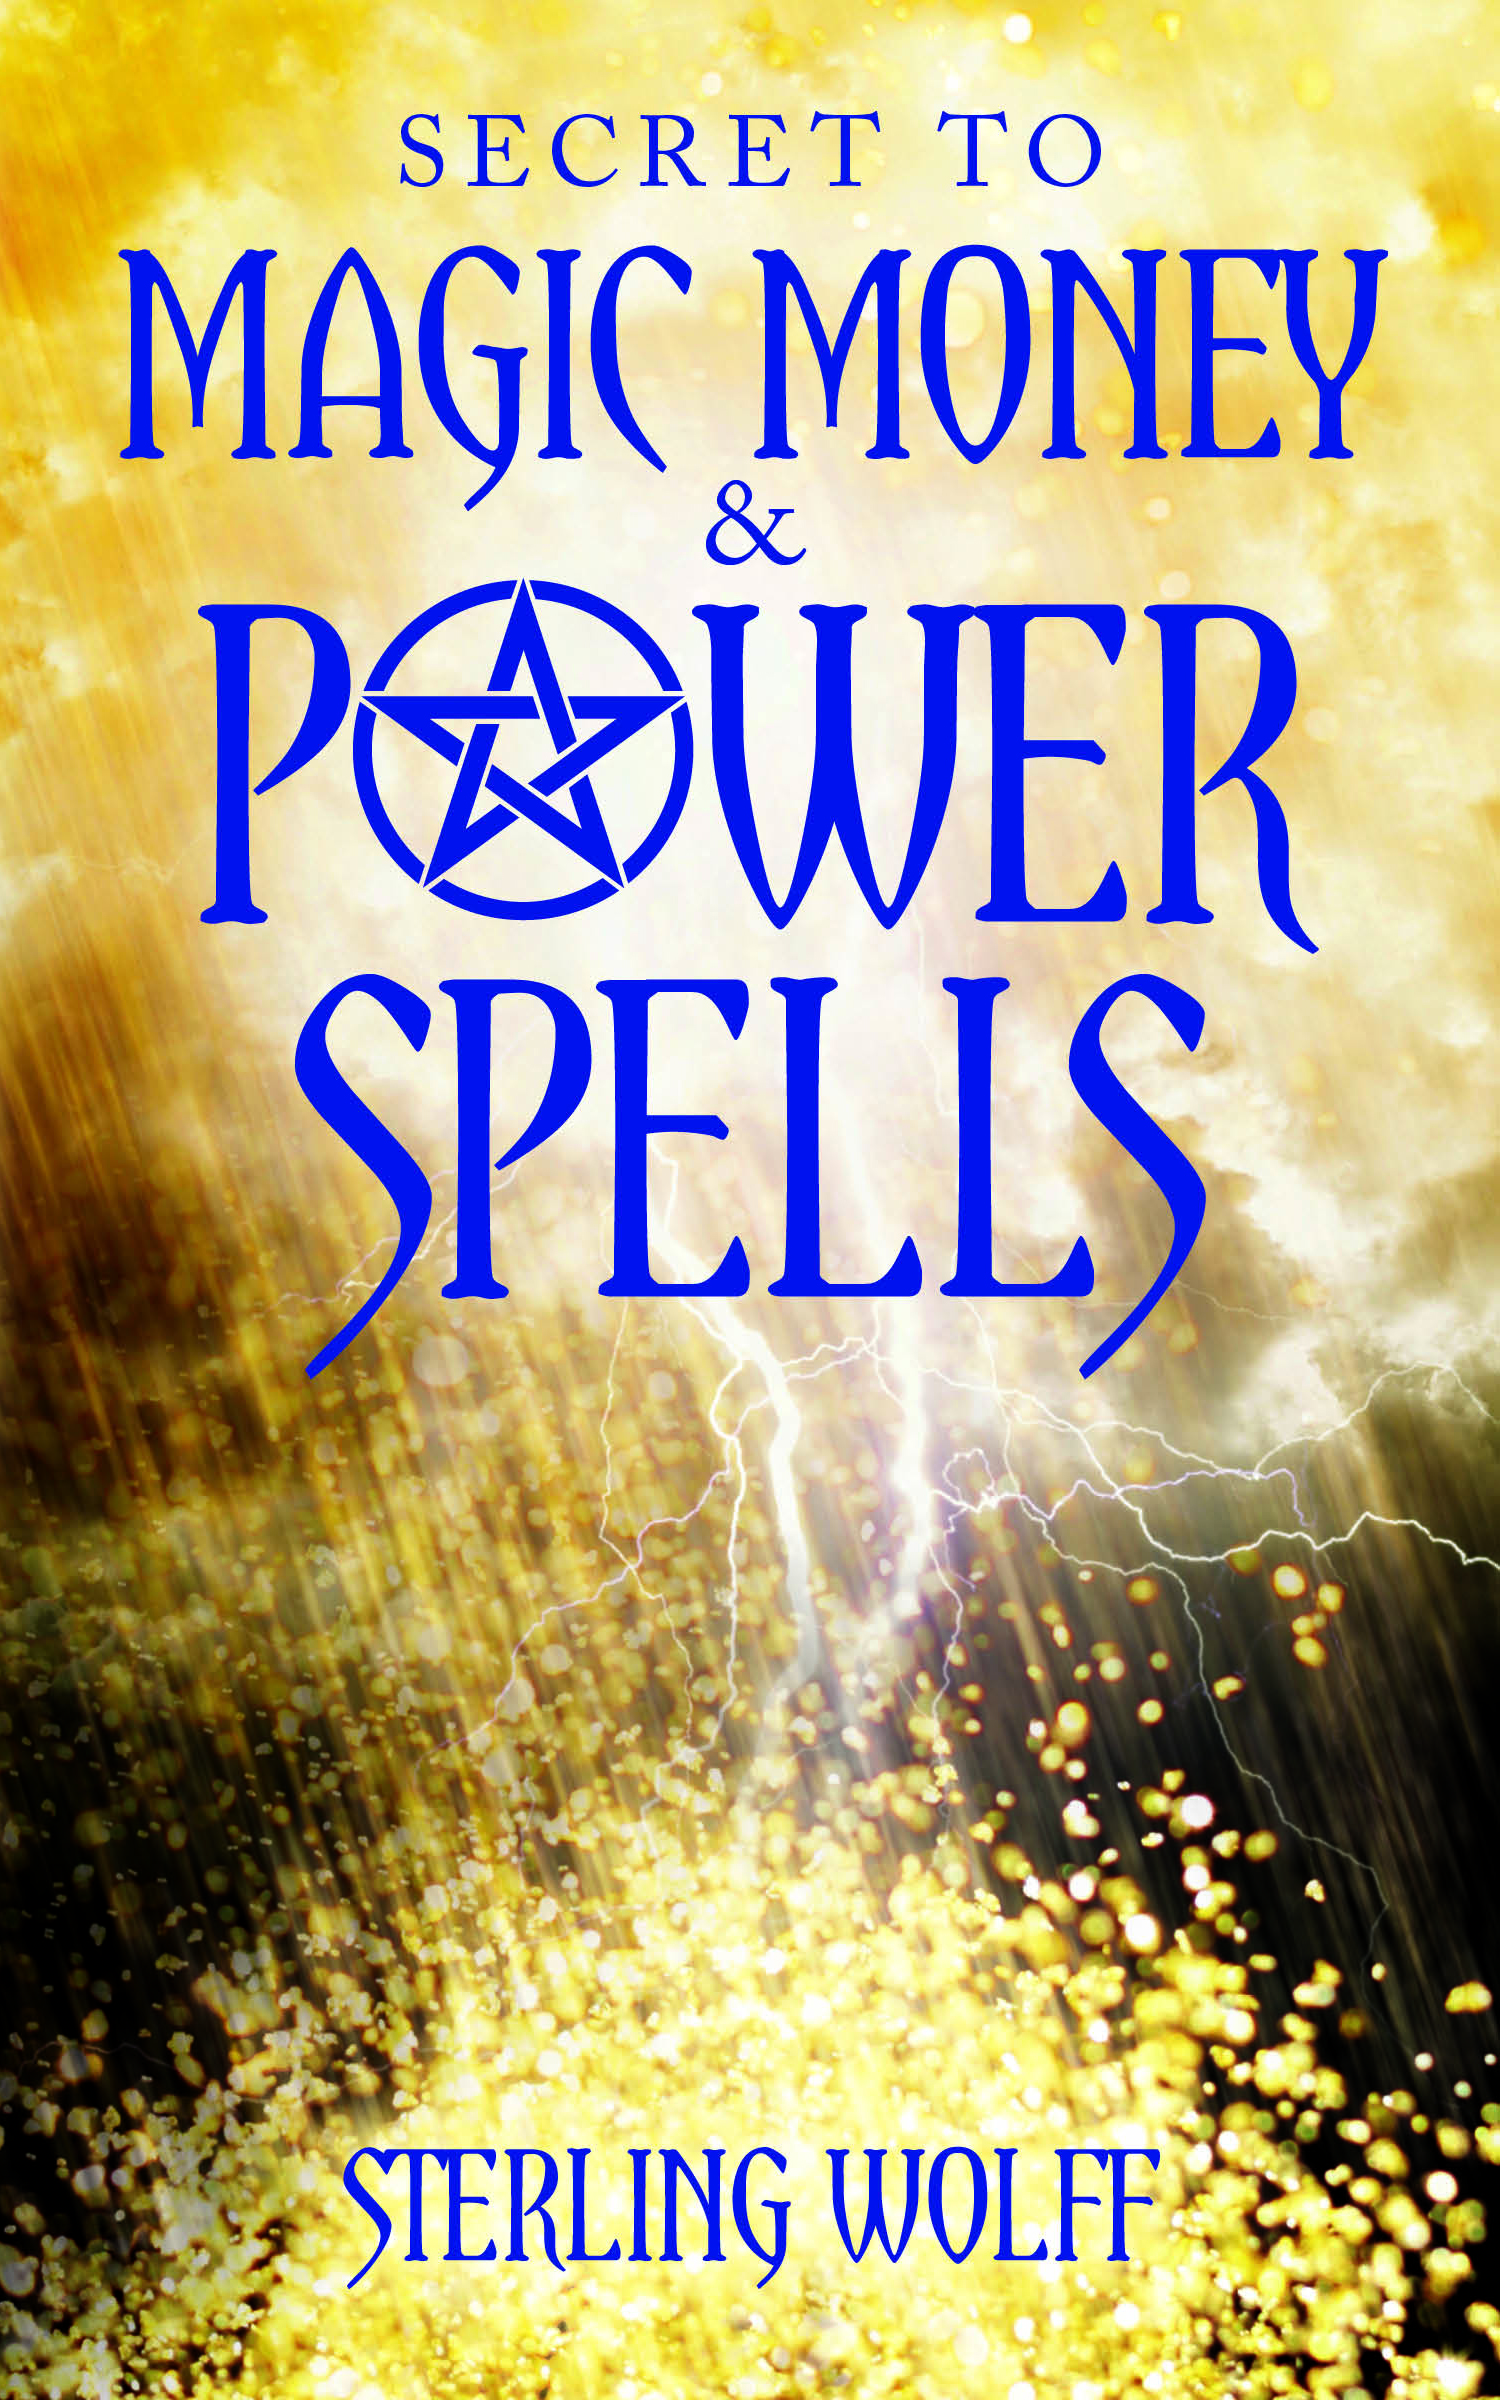 SECRET TO MAGIC MONEY & POWER SPELLS